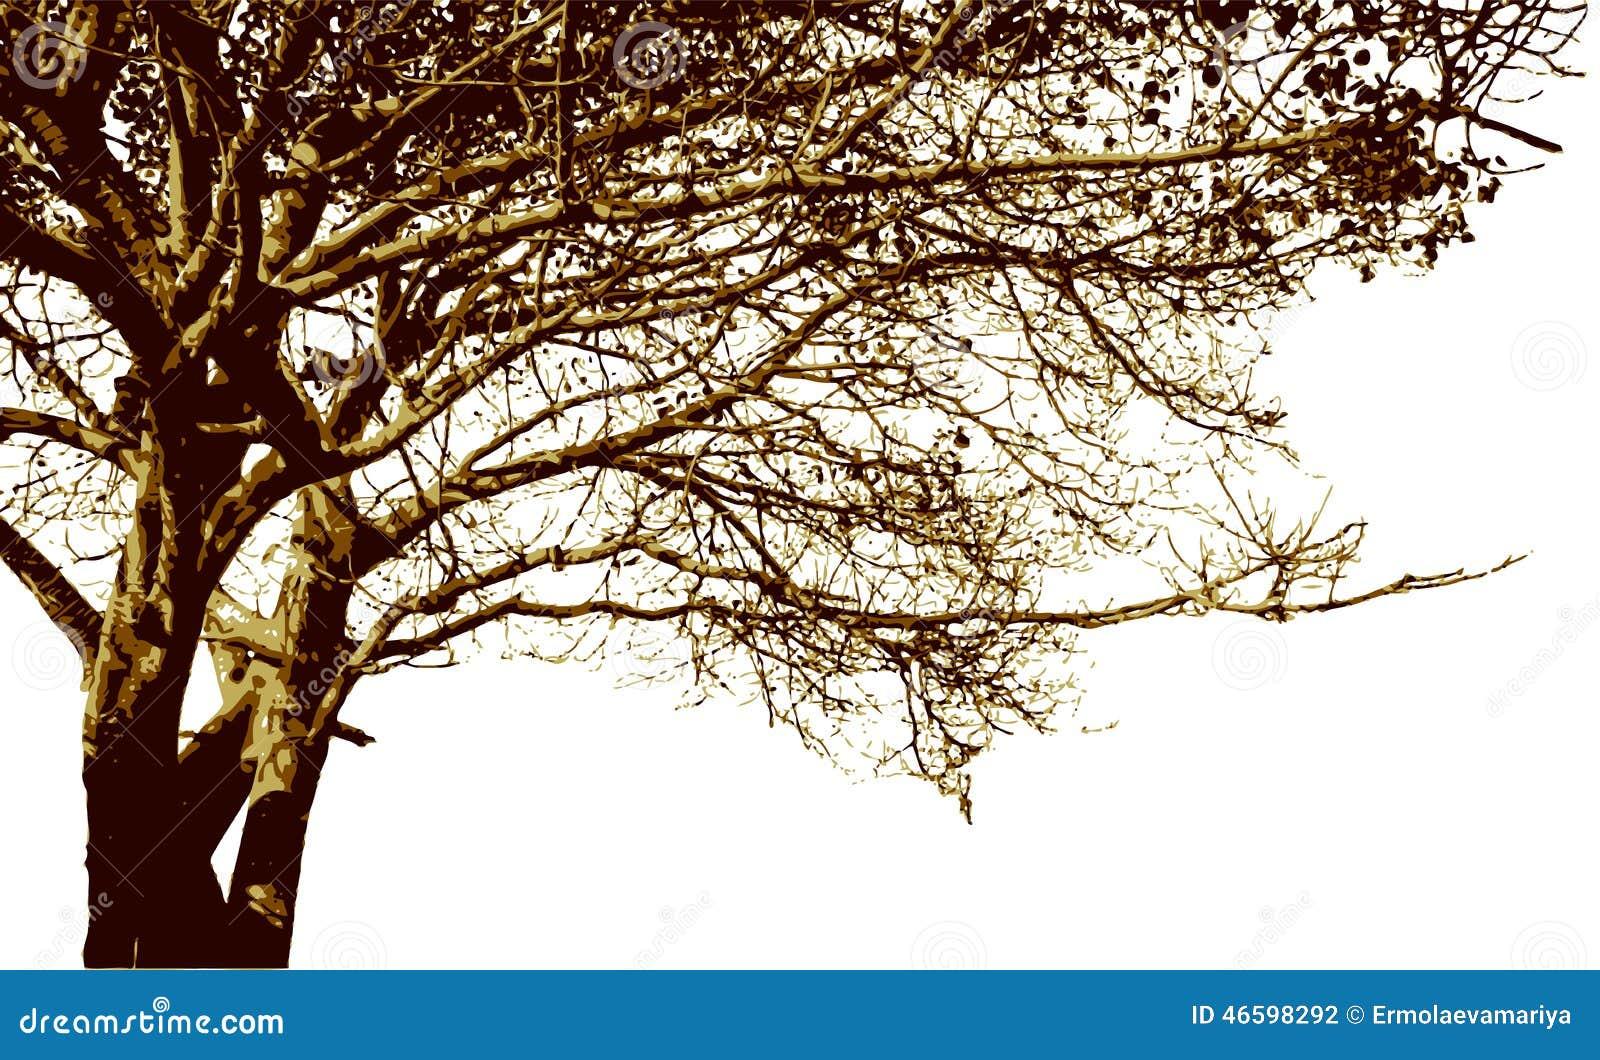 big tree and branches silhouette detailed vector stock On nombre de arbol grande de ramas frondosas